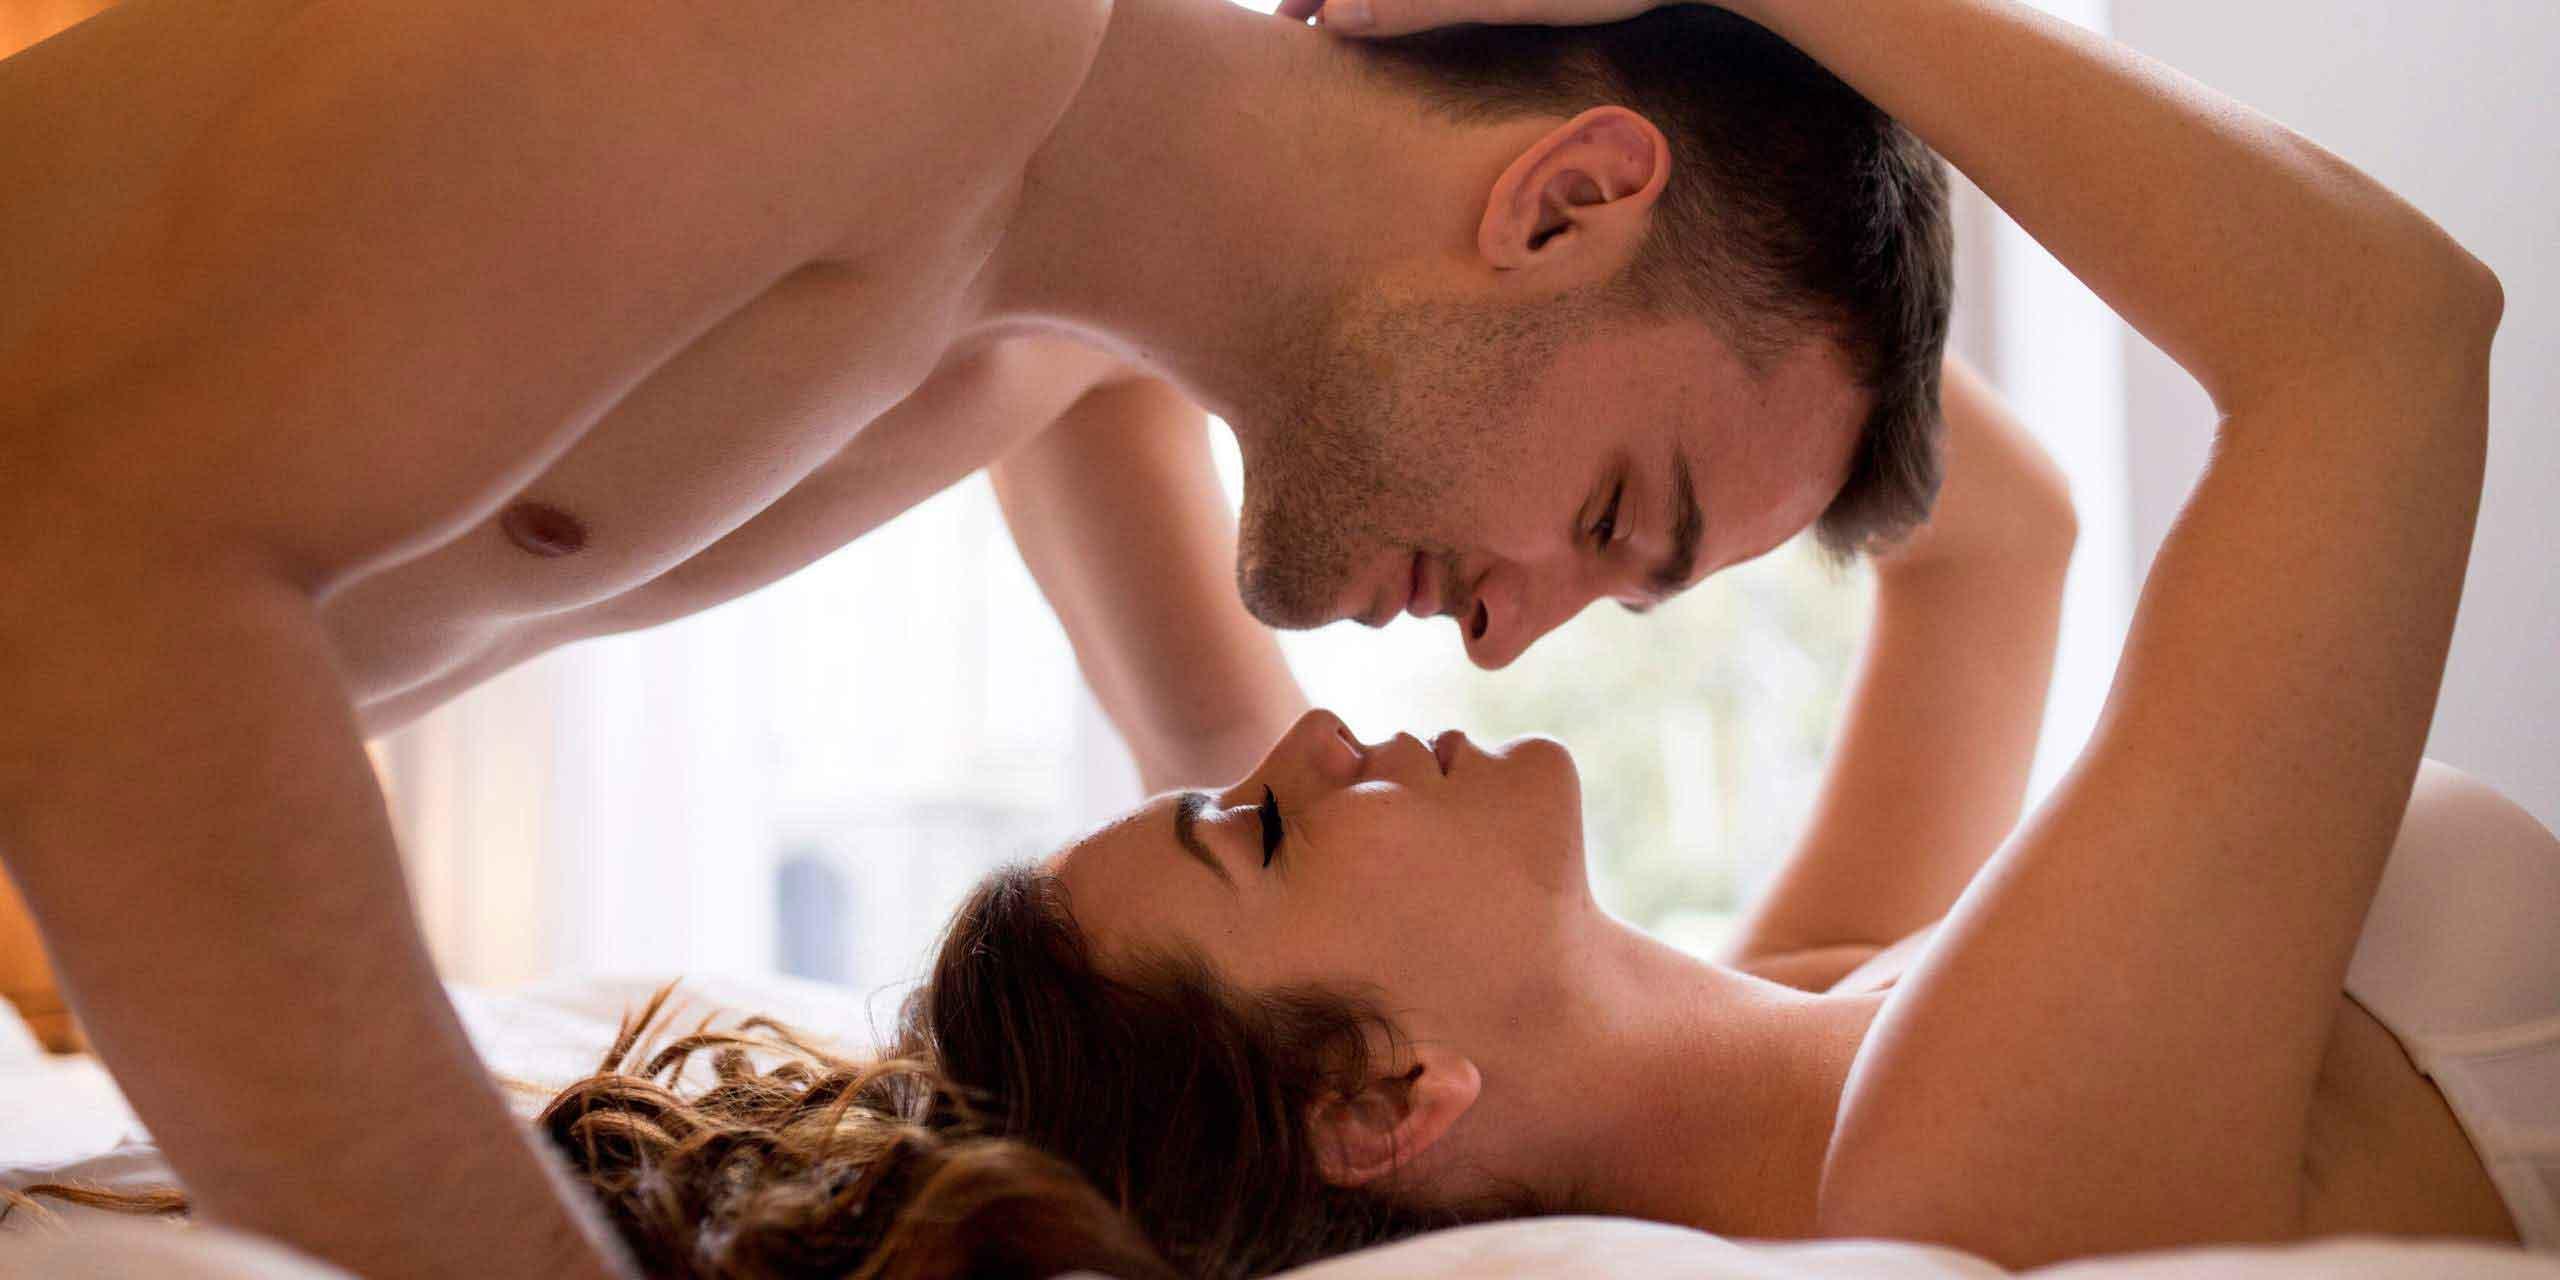 Romatischer Sex